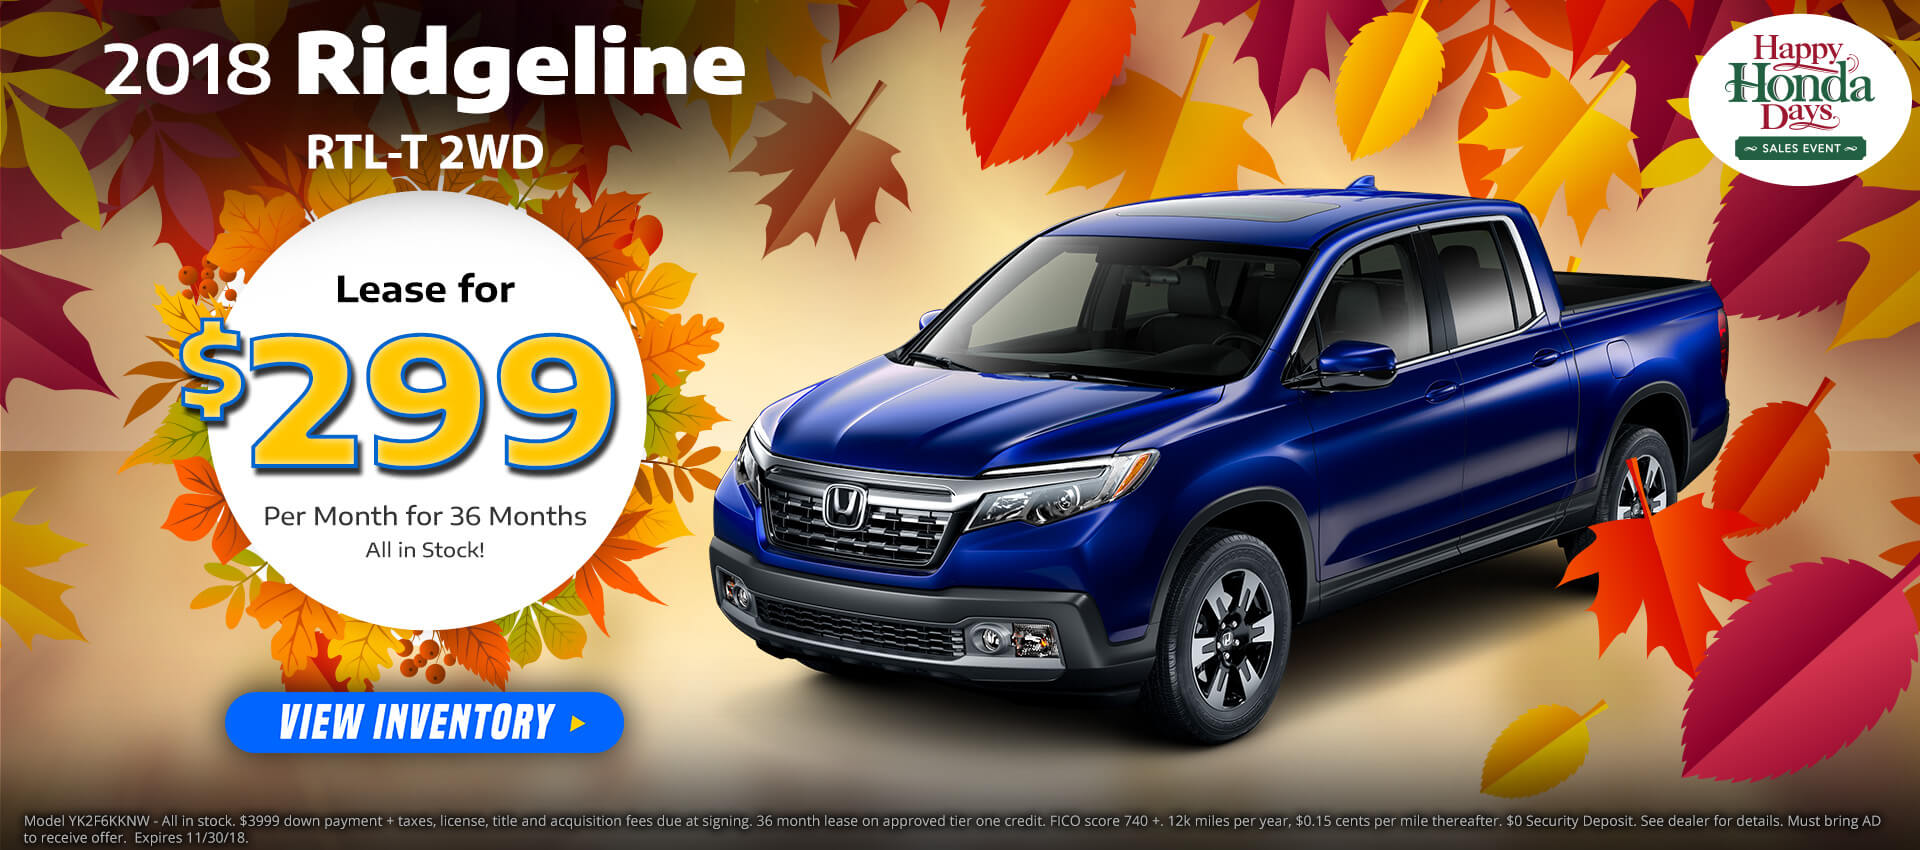 Honda Ridgeline $299 Lease